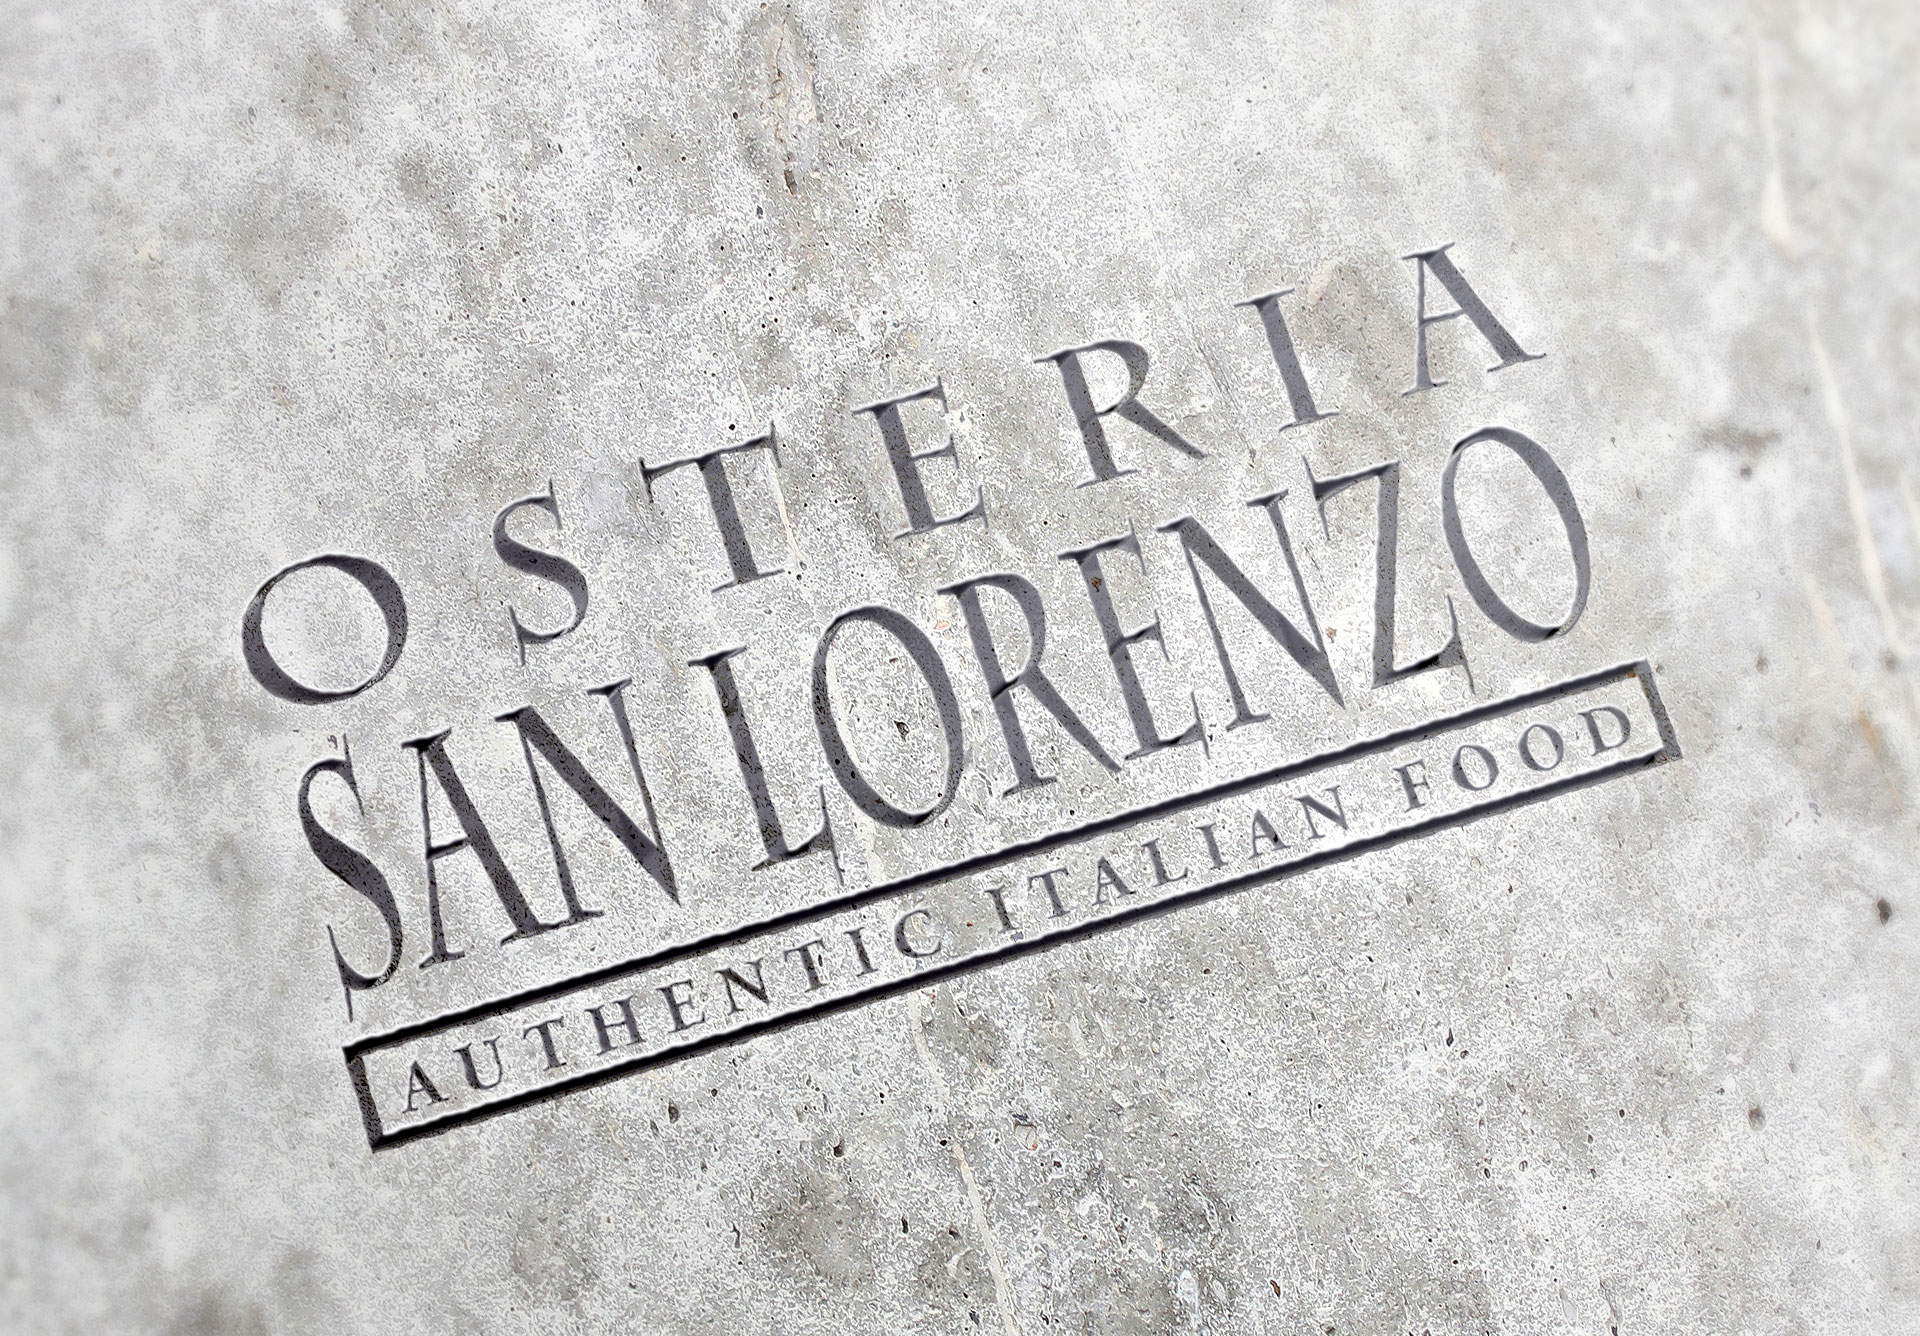 Osteria San Lorenzo